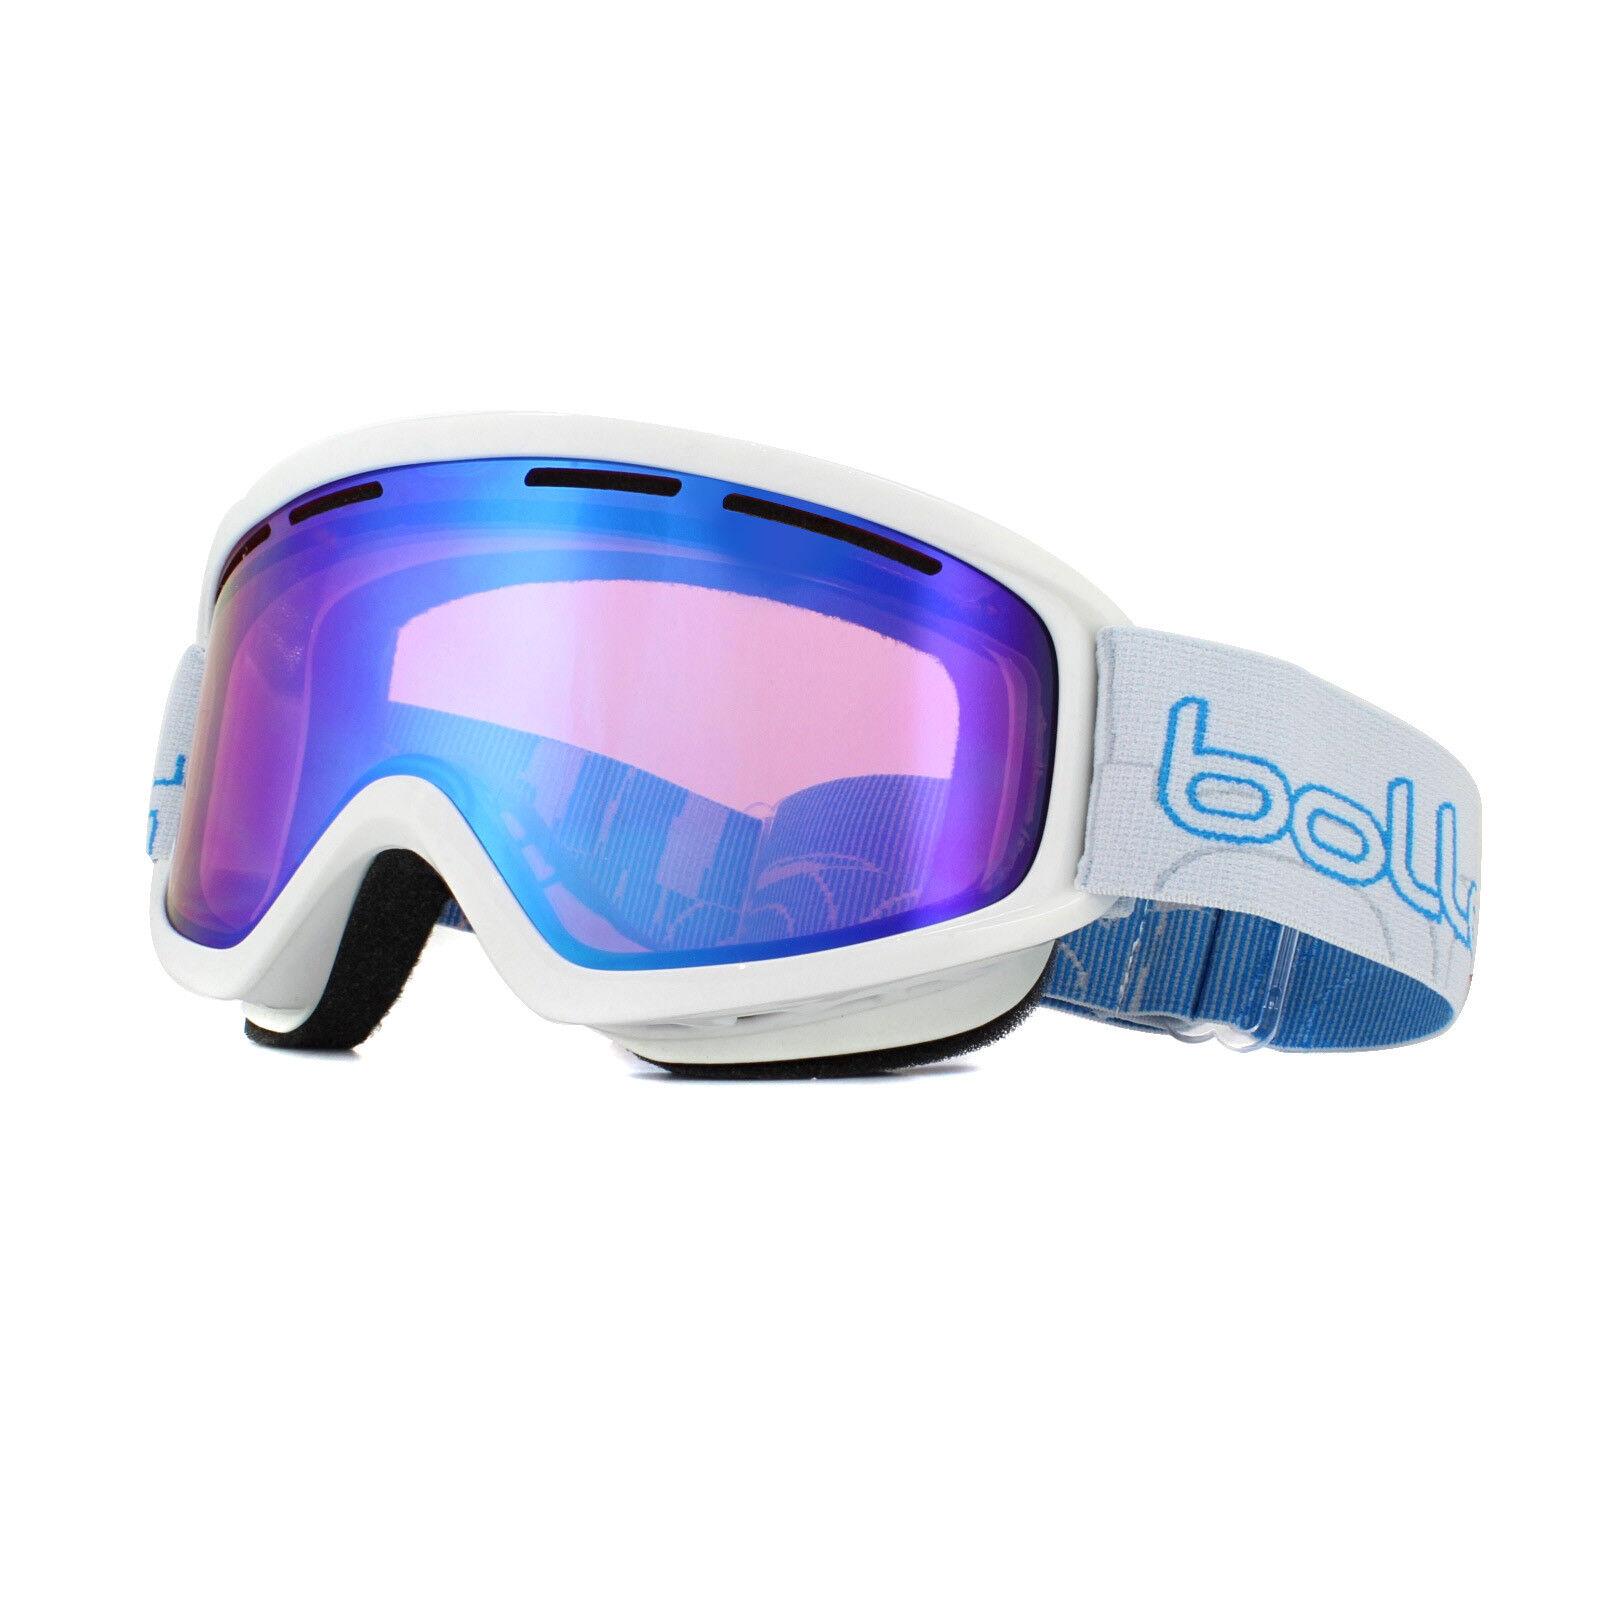 Bolle Bolle Bolle Gafas Esquí Schuss 21483 Blanco Brillante Aurora 40a02b